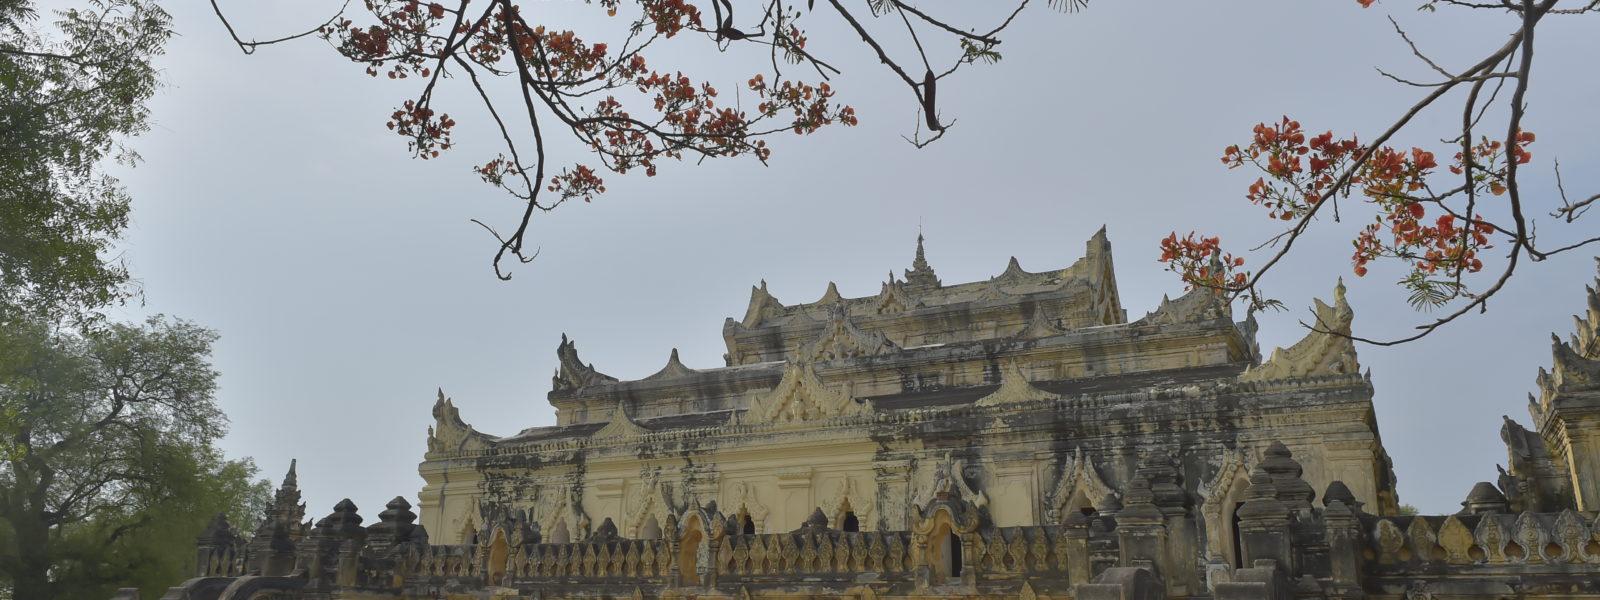 Inwa - Buddha Image - Mandalay - Sampan Travel